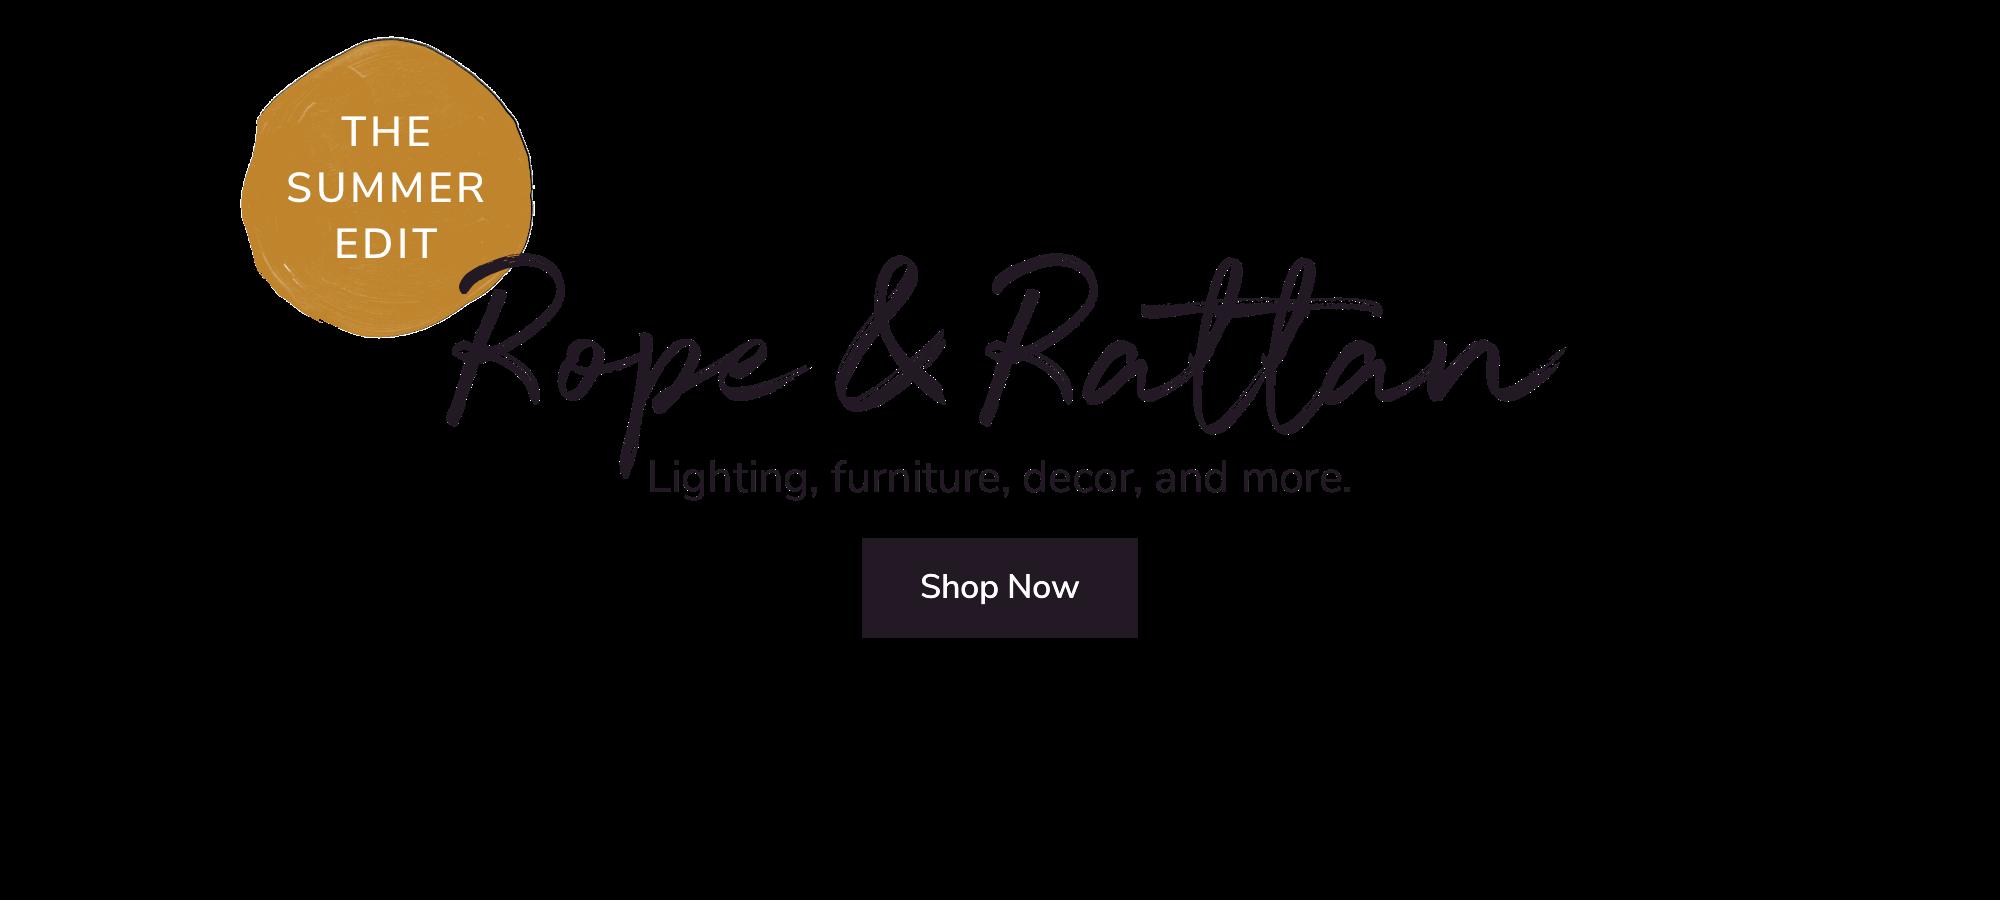 The Summer Edit: Rope & Rattan